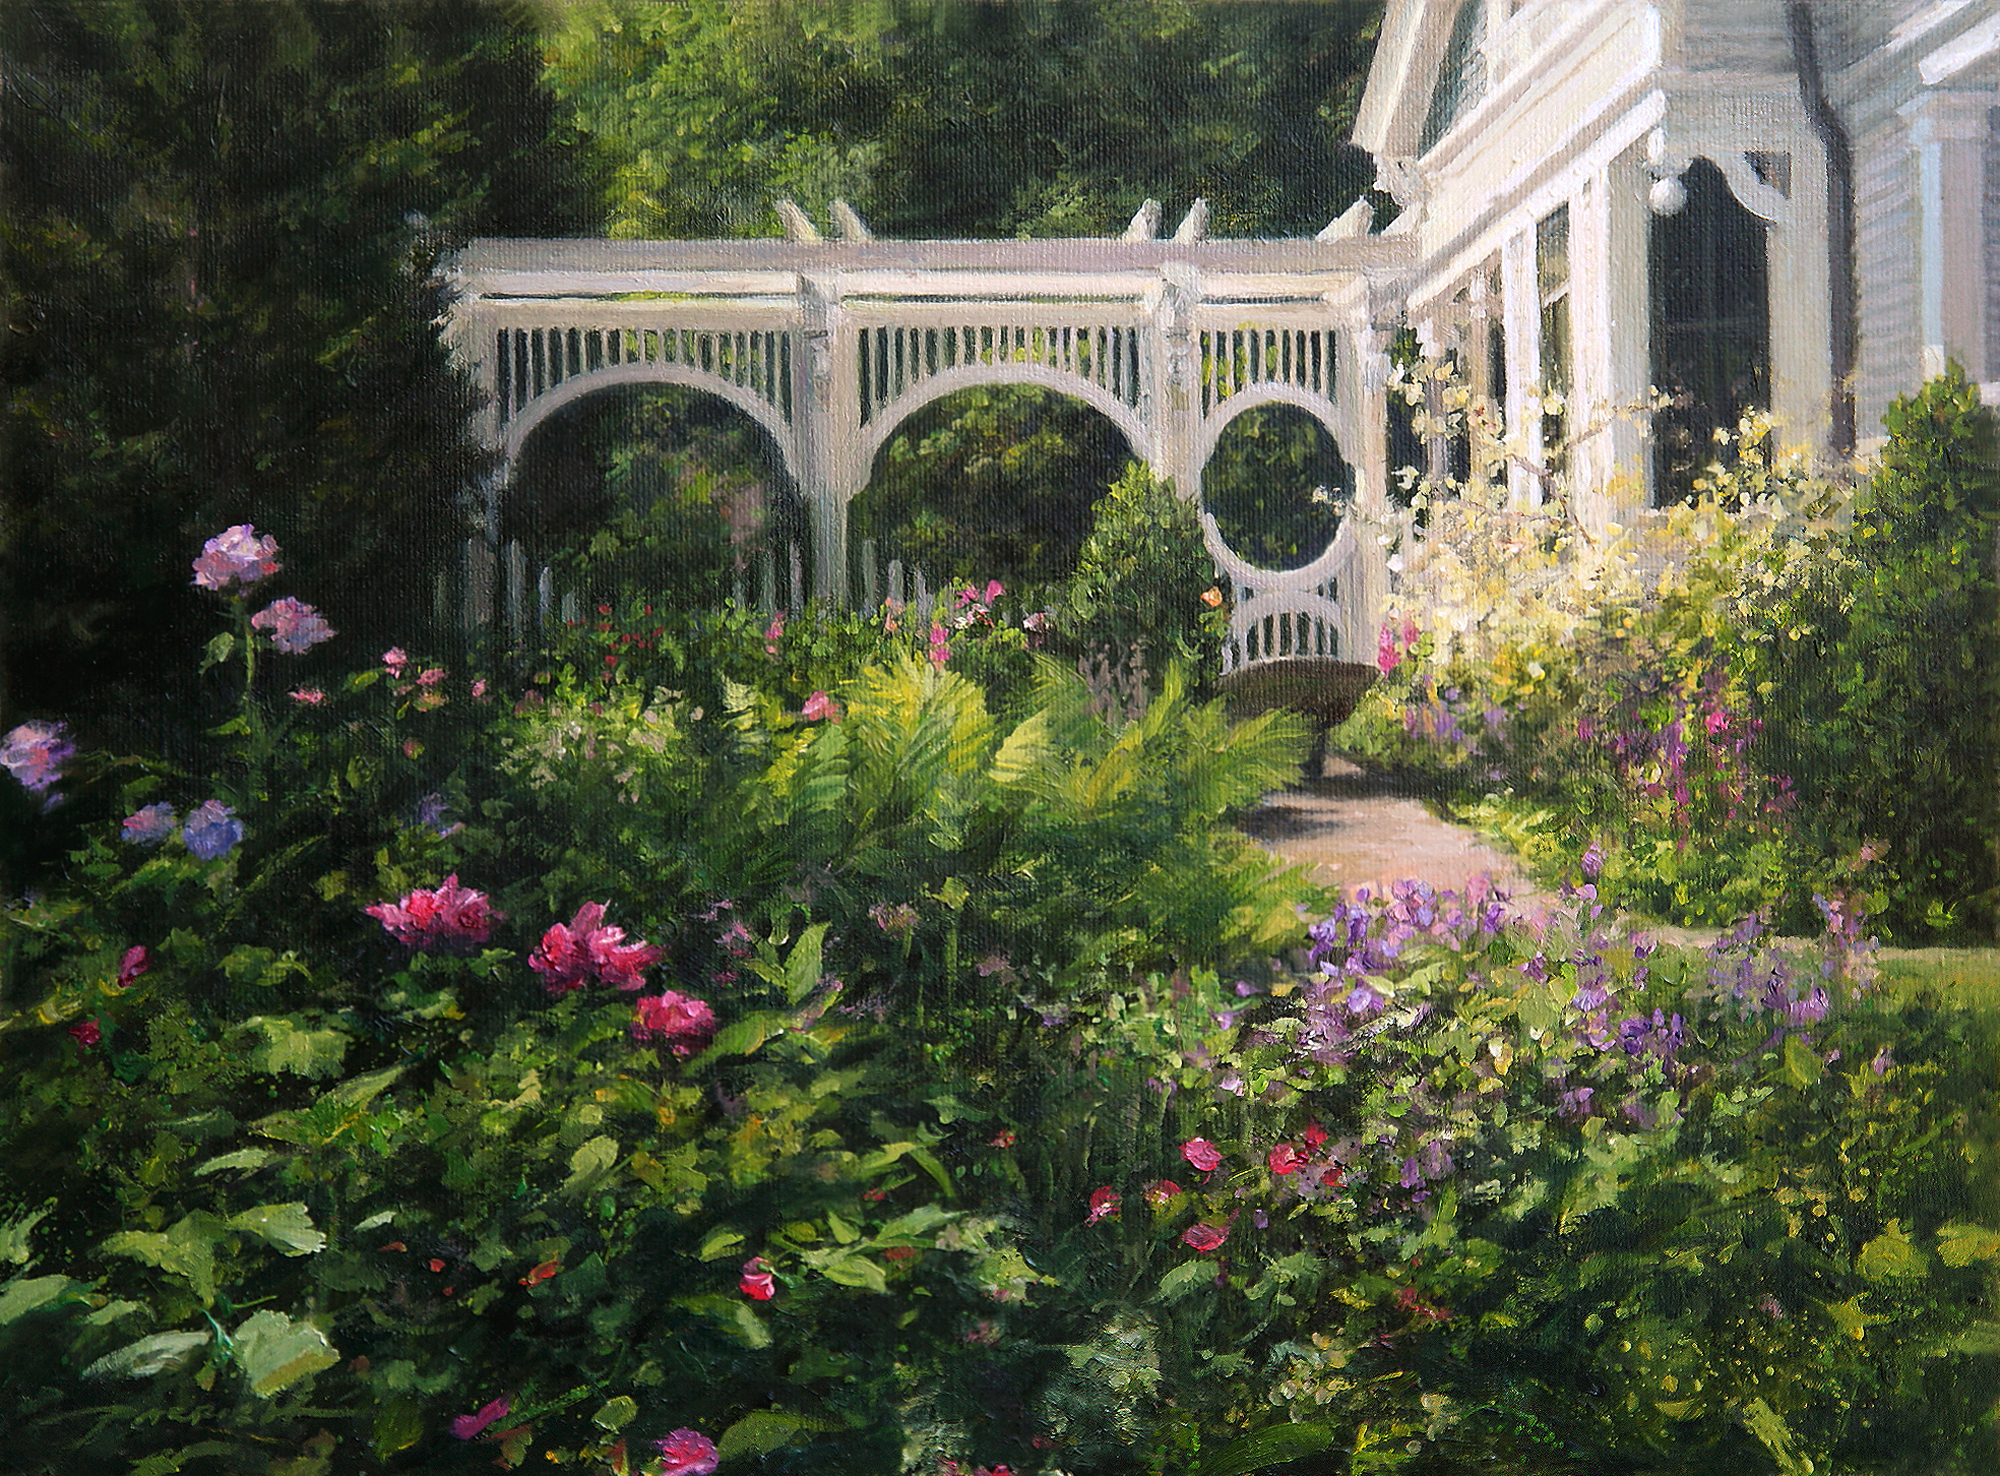 The Gardener's Old Friend By Bradley J. Parrish